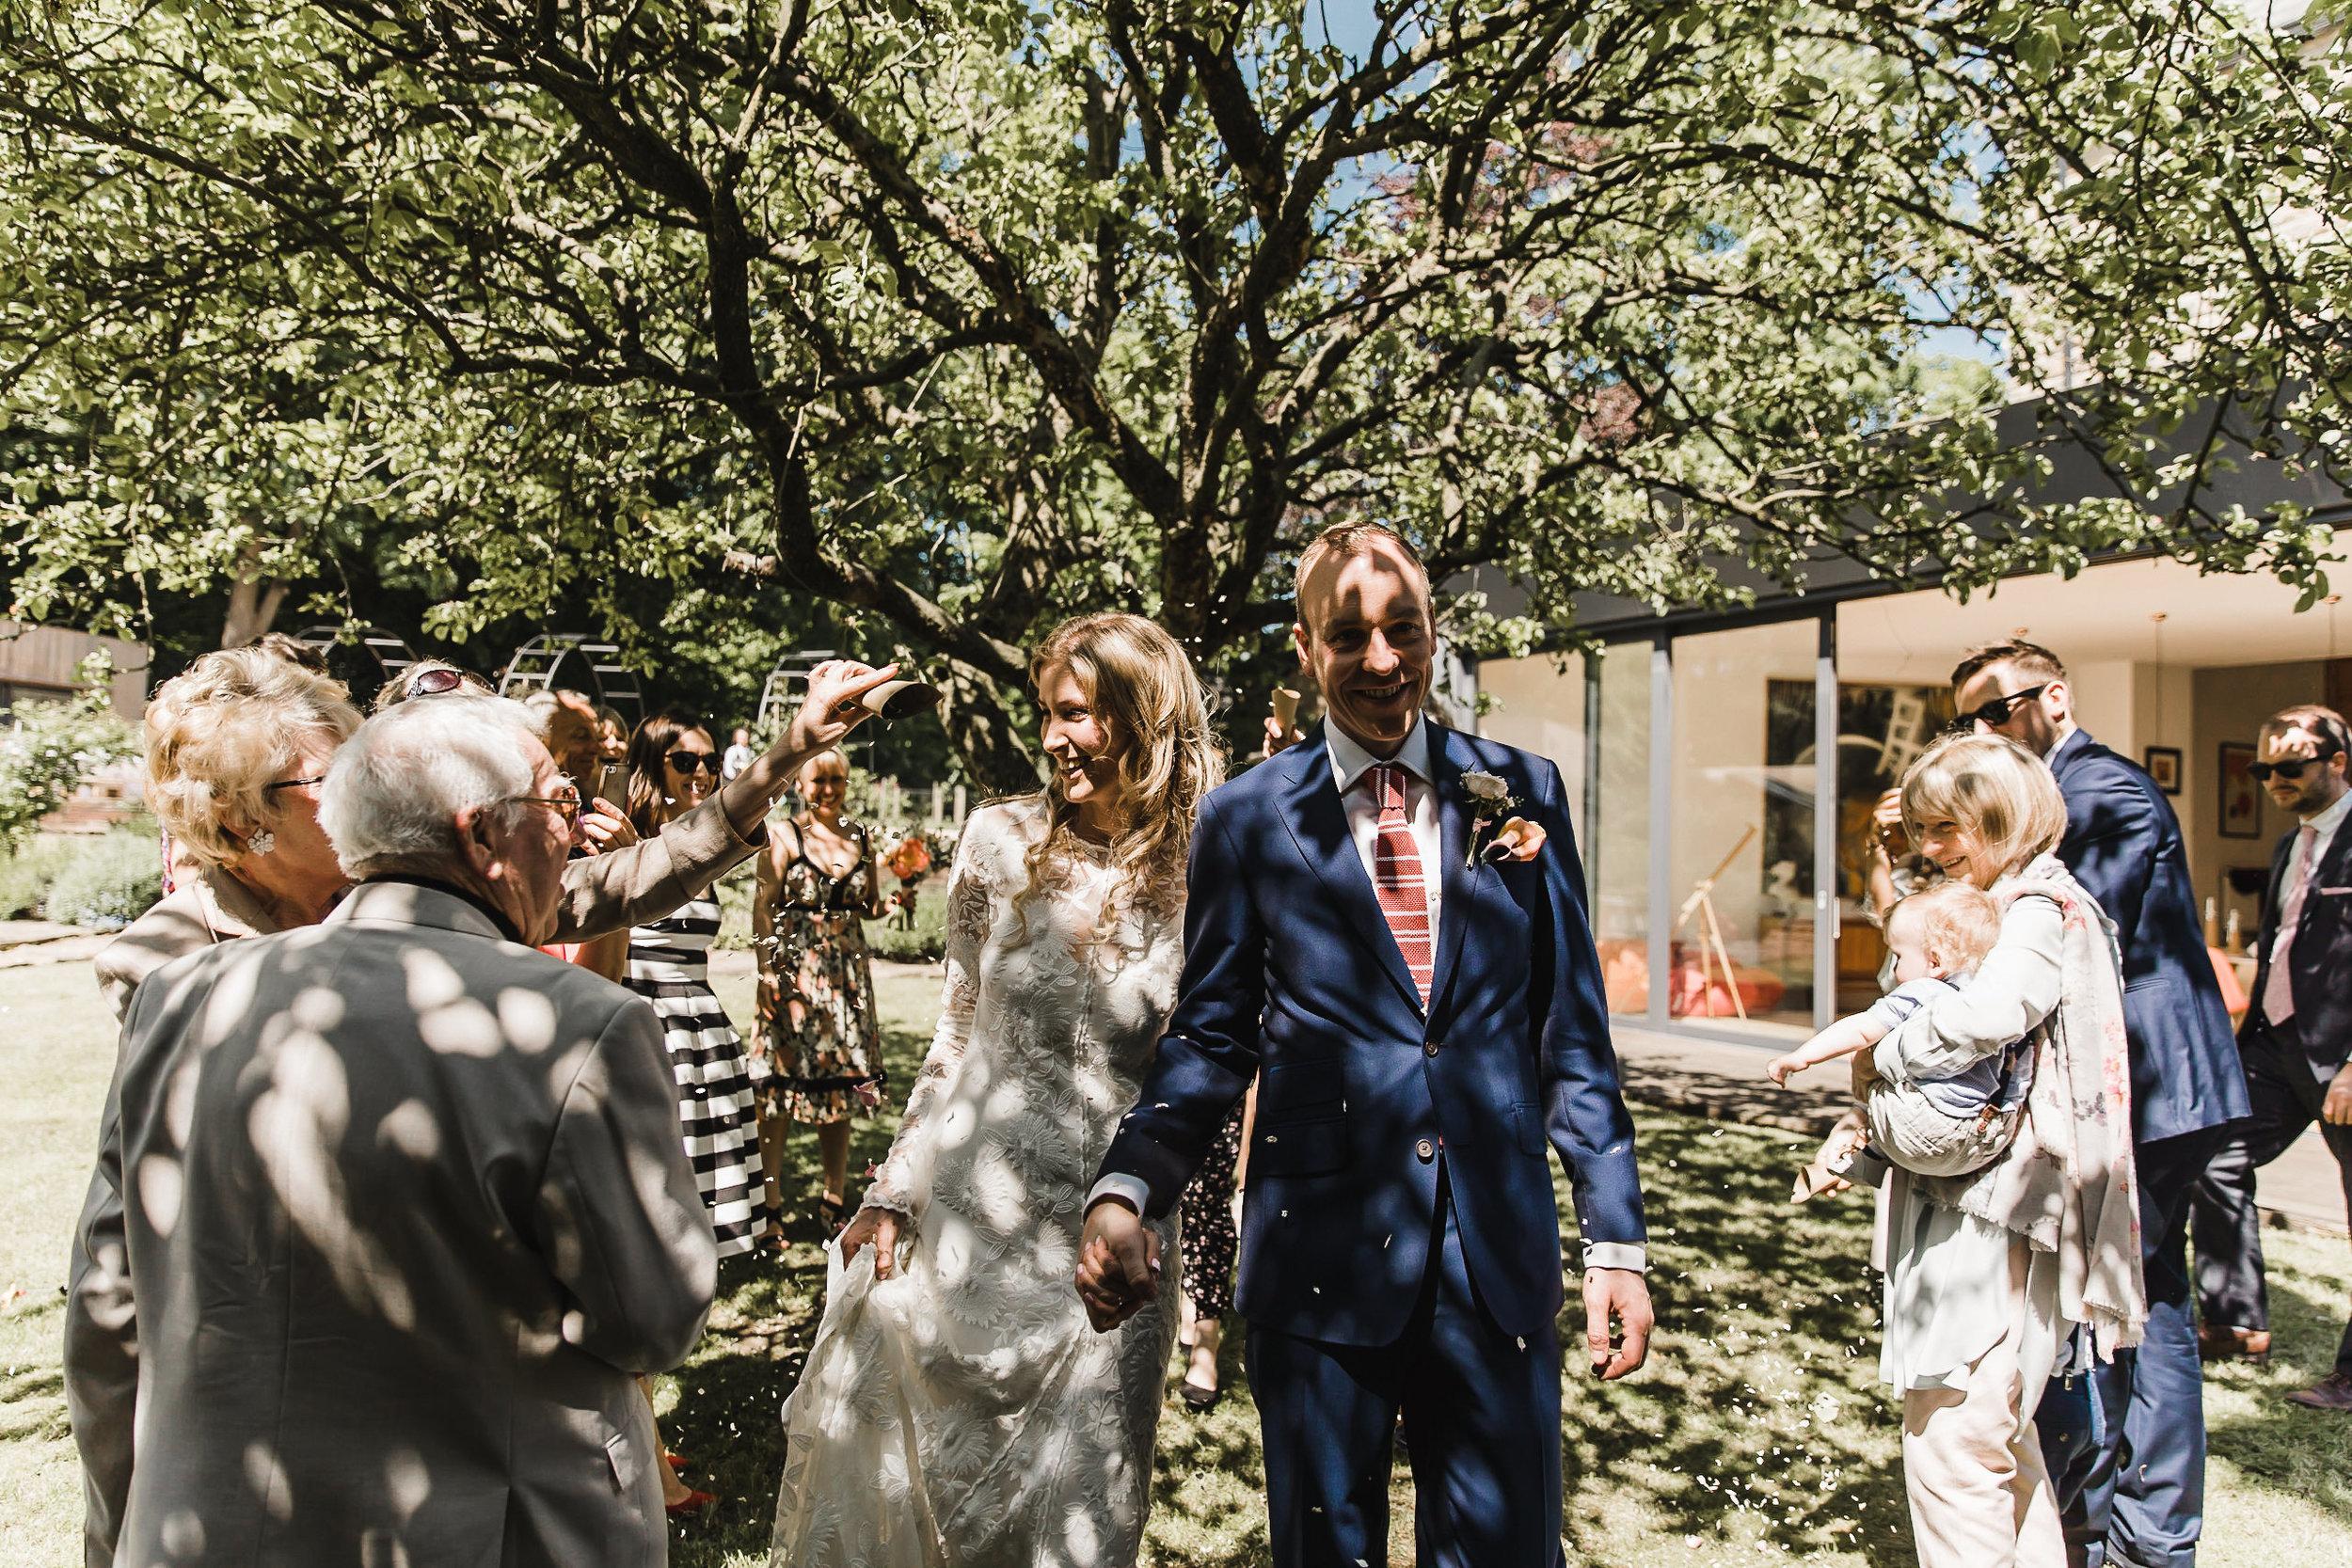 Roundhay-Leeds-Backyard-Wedding-Becs-Chris-102.jpg